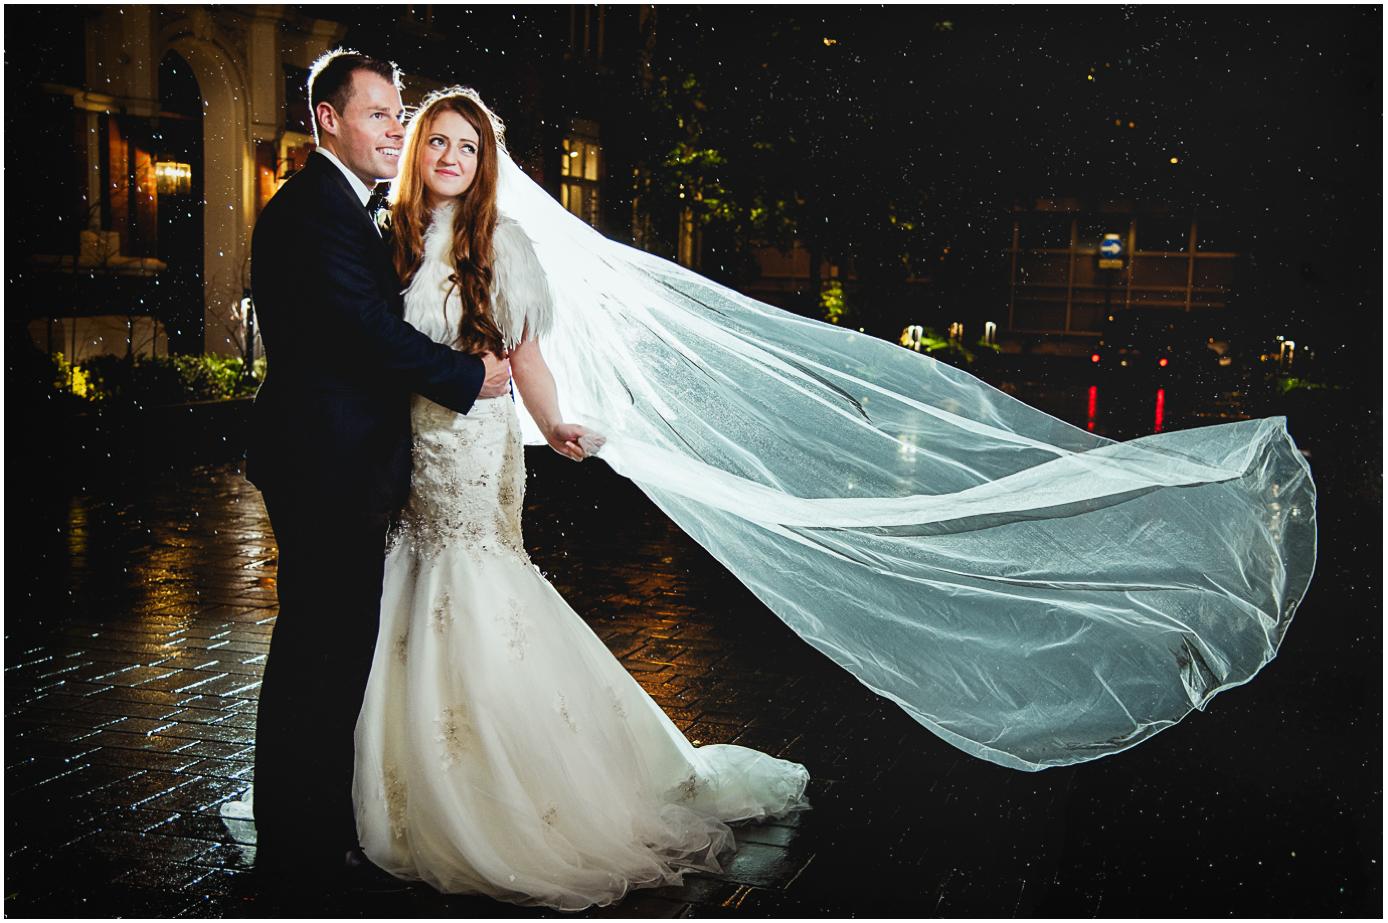 53 - Esmat and Angus - St. Ermin's Hotel London wedding photographer